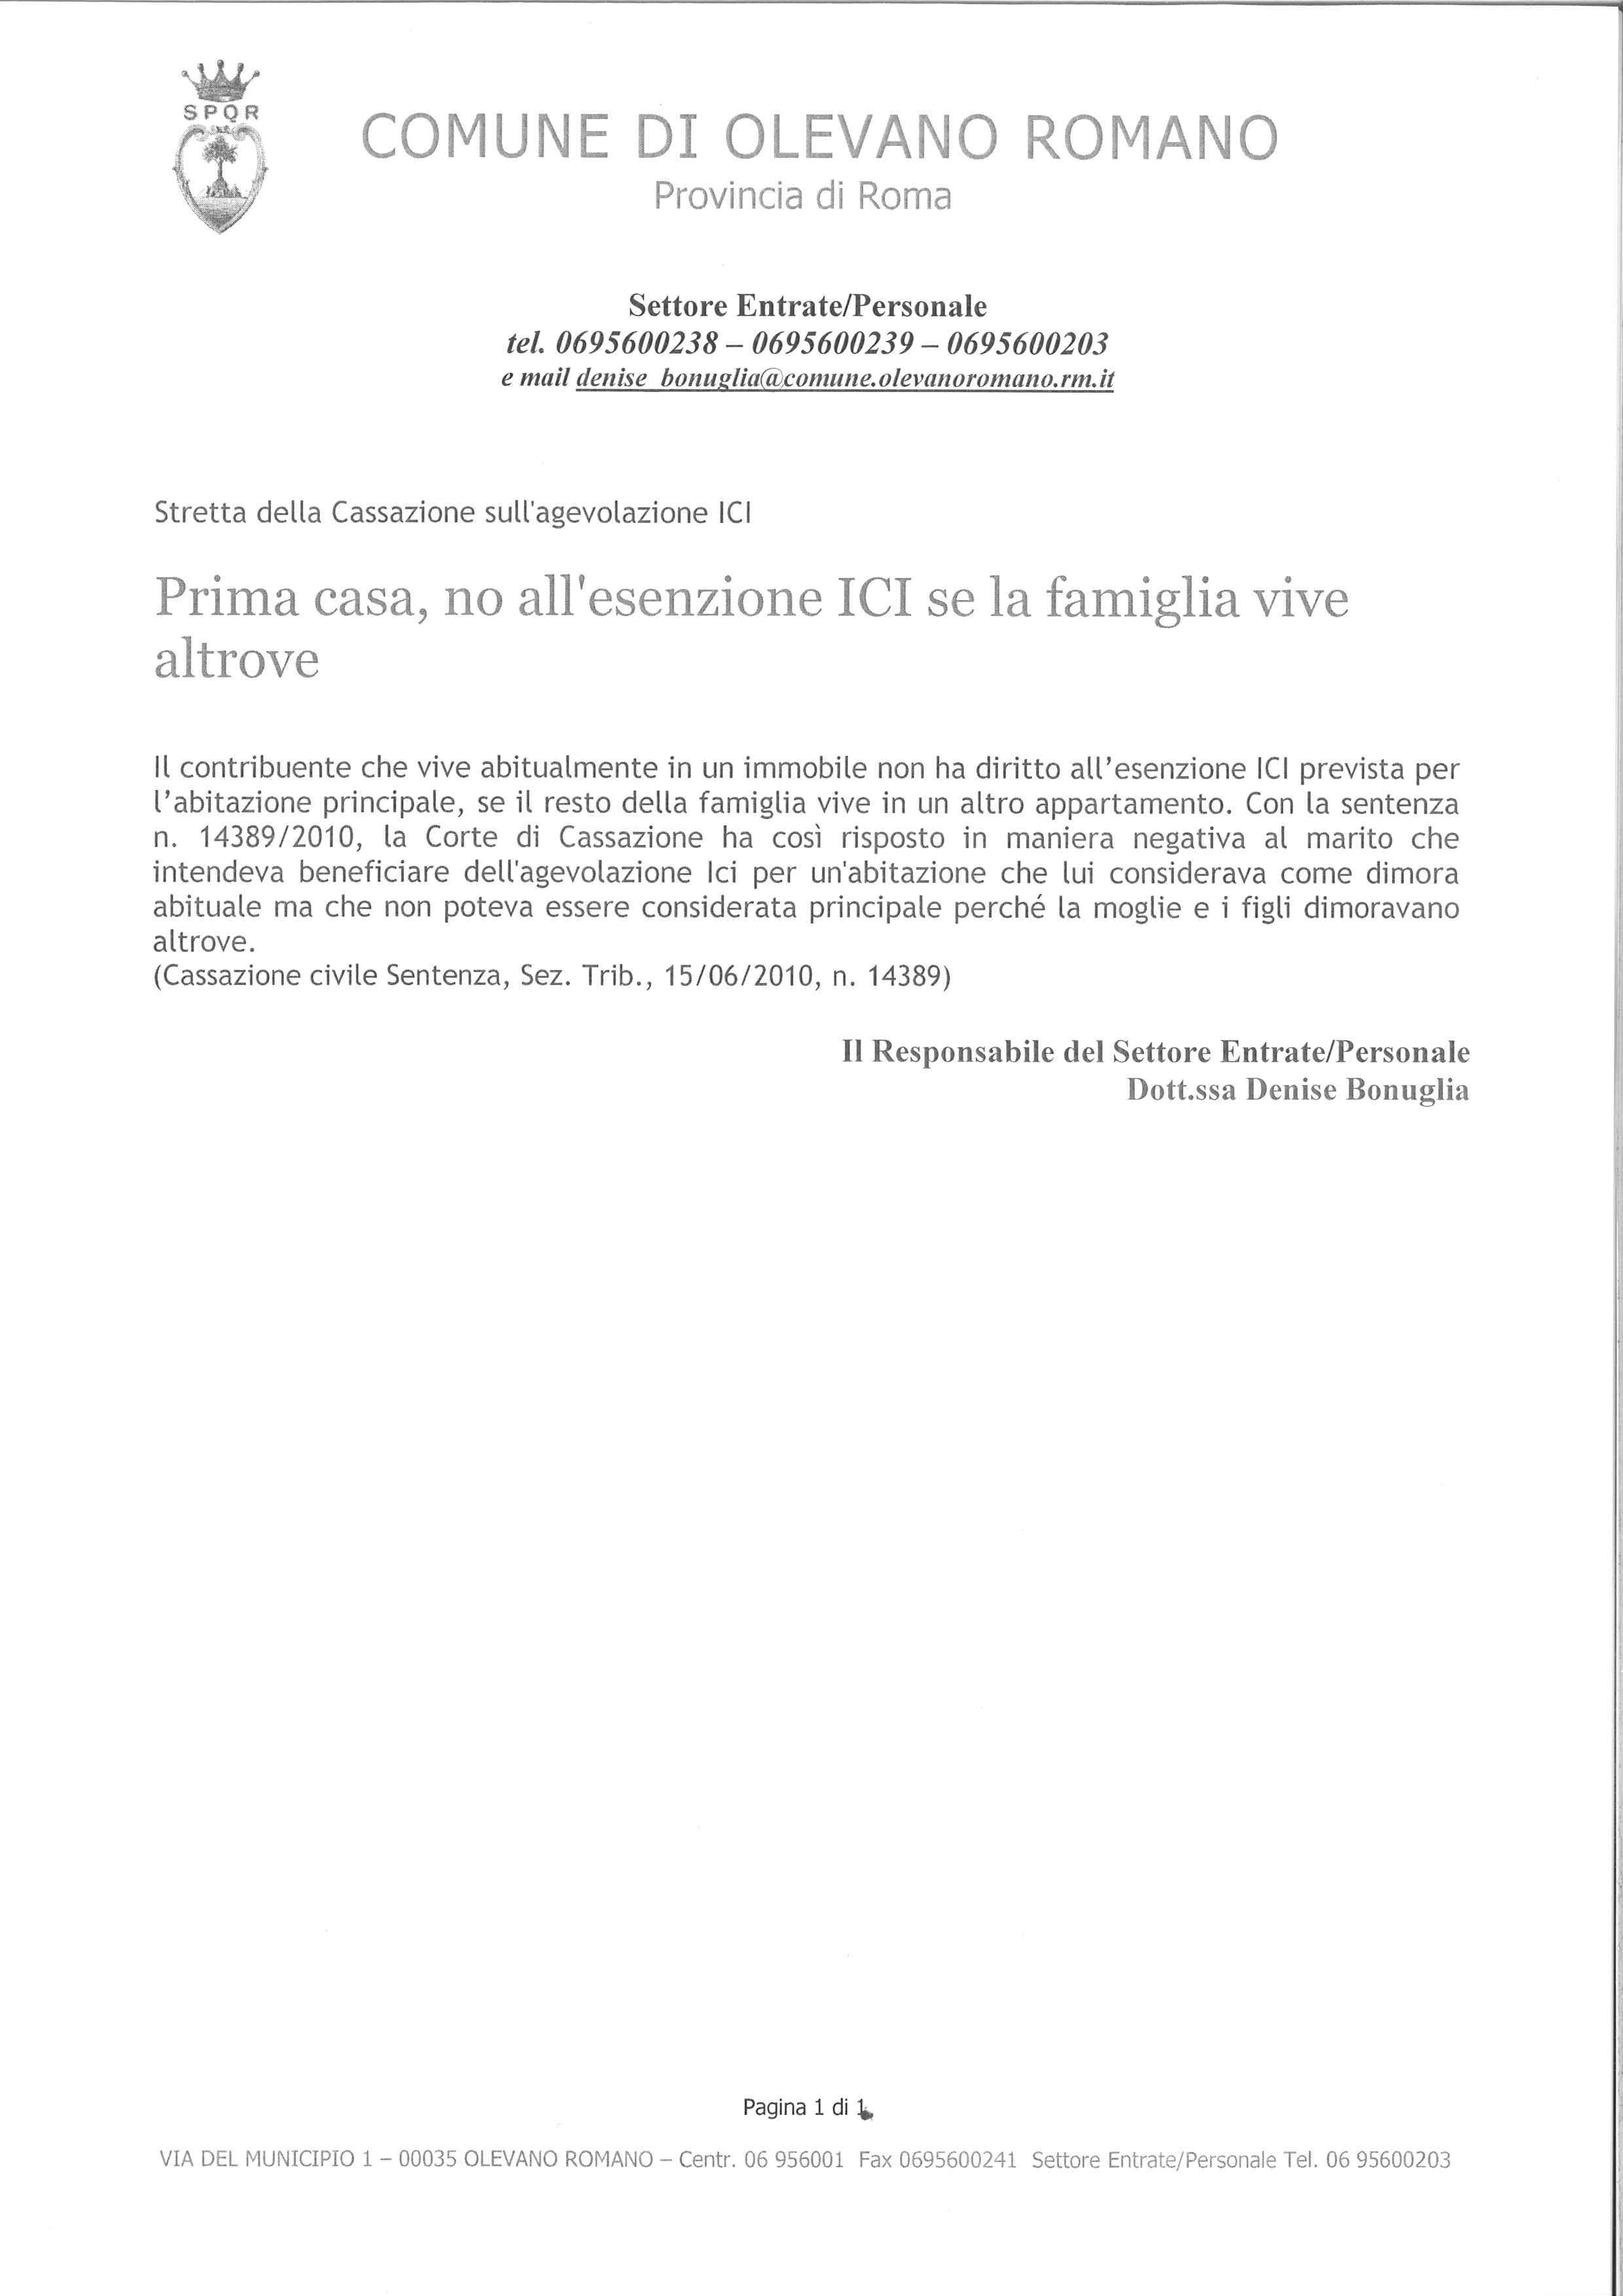 https://www.comune.olevanoromano.rm.it/immagini_pagine/public/locandina/48-ICI_0001.jpg